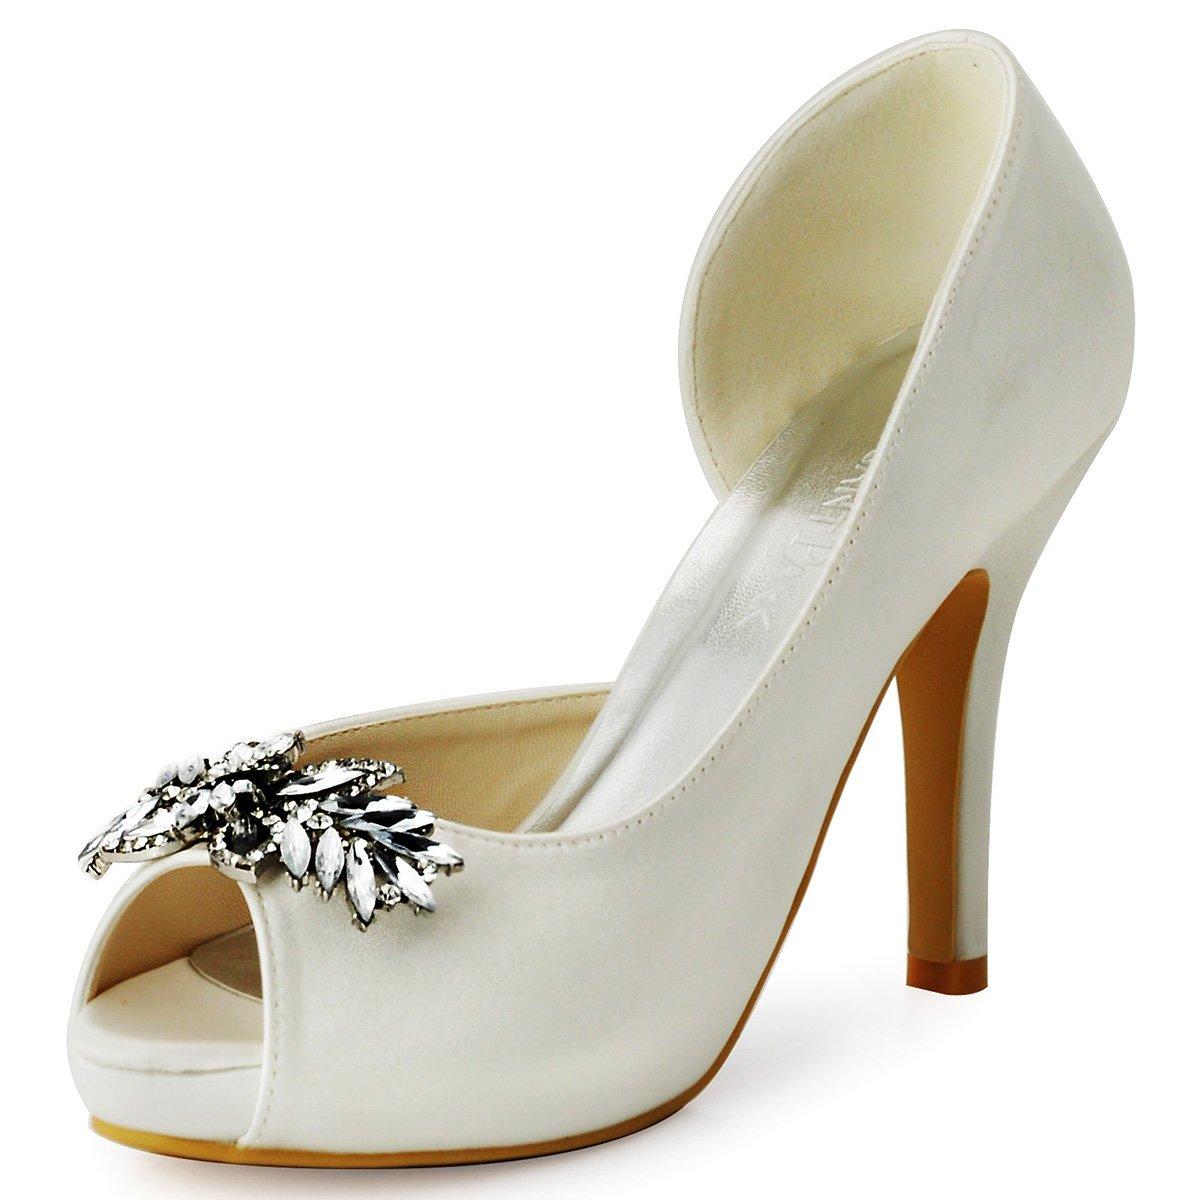 65c25feafced ElegantPark HP1560IAC Women s Peep Toe Platform High Heel Rhinestones Satin  Wedding Party Dress Shoes  Amazon.ca  Shoes   Handbags